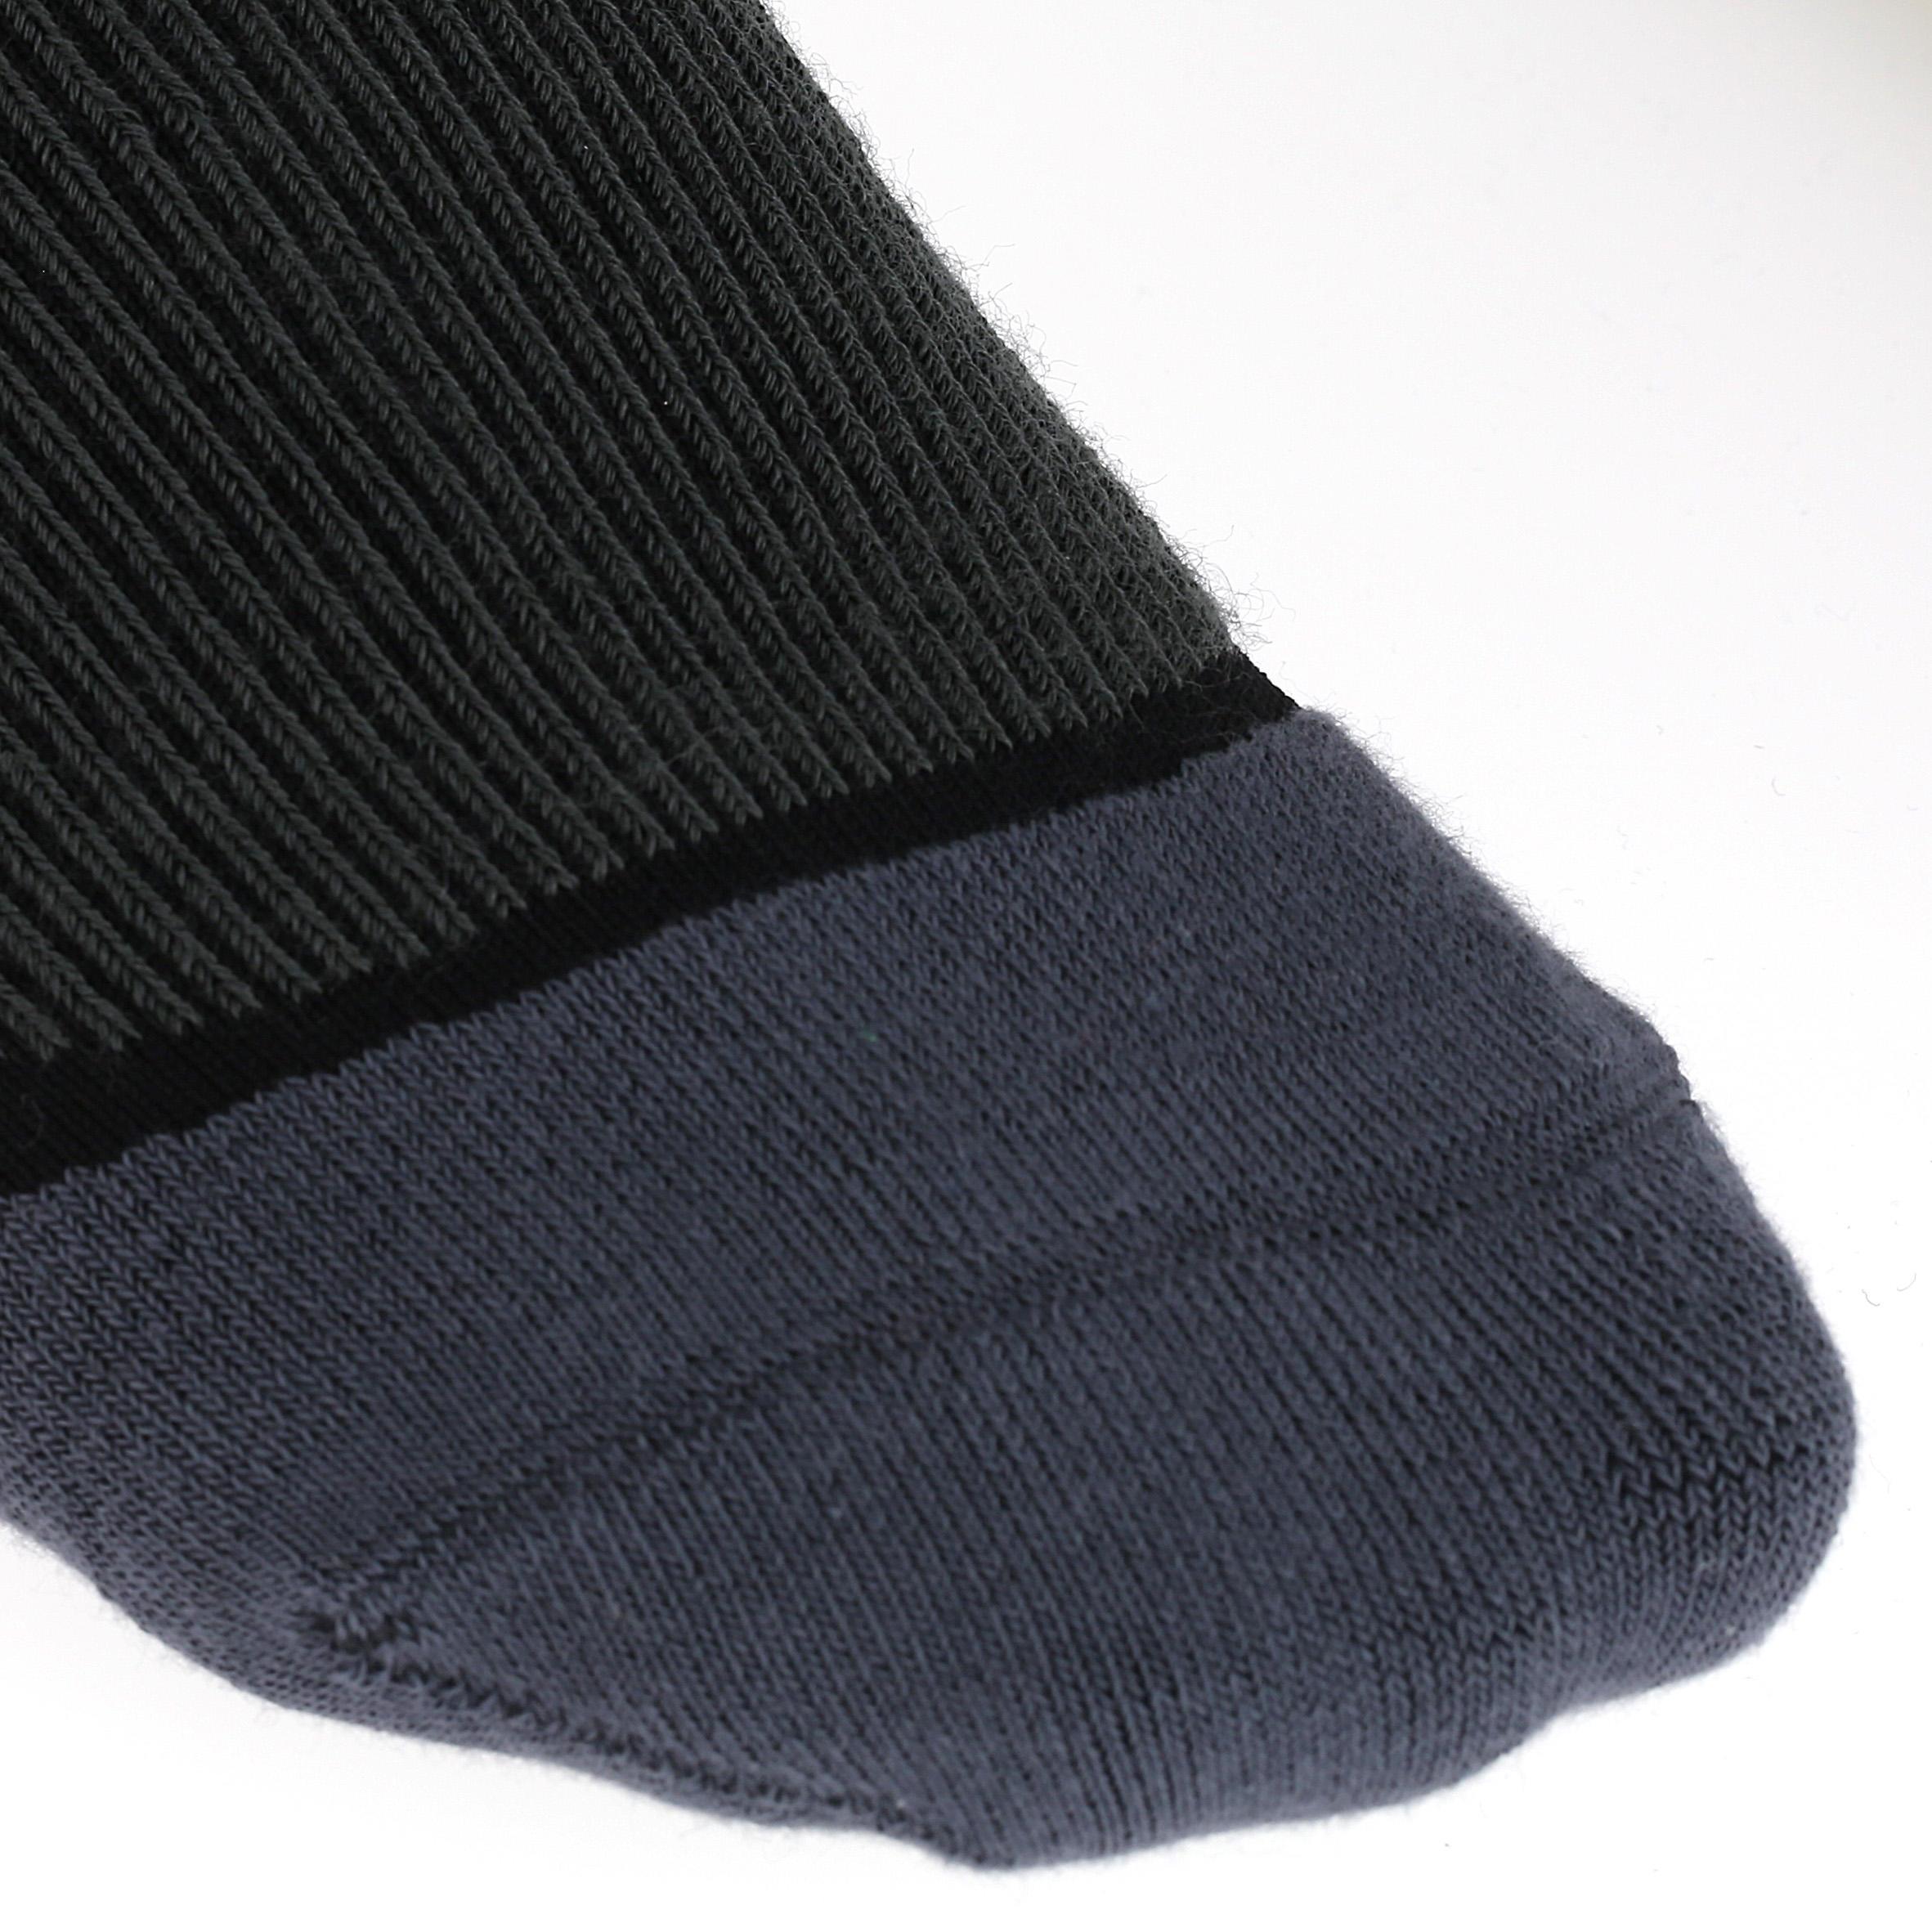 Equarea Adult Horse Riding Socks 1-Pair - Black